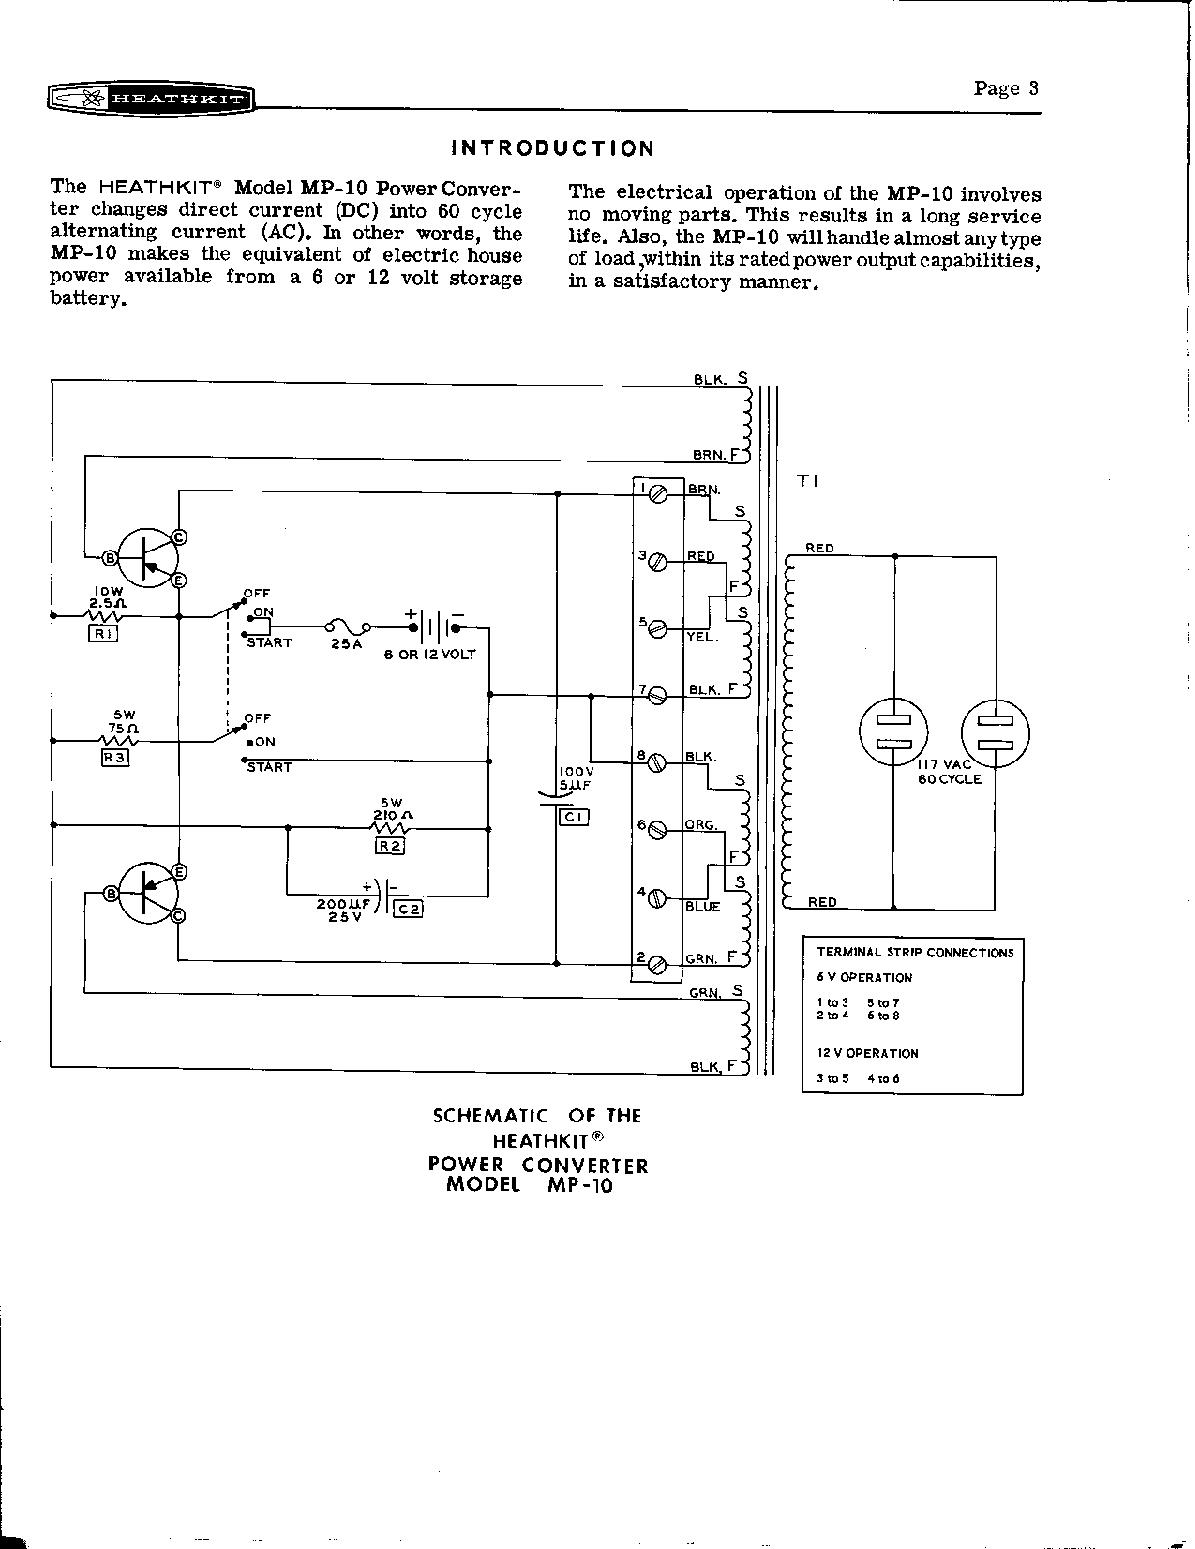 yale kg51lt 4ouf forklift service manual basic instruction manual u2022 rh ryanshtuff co